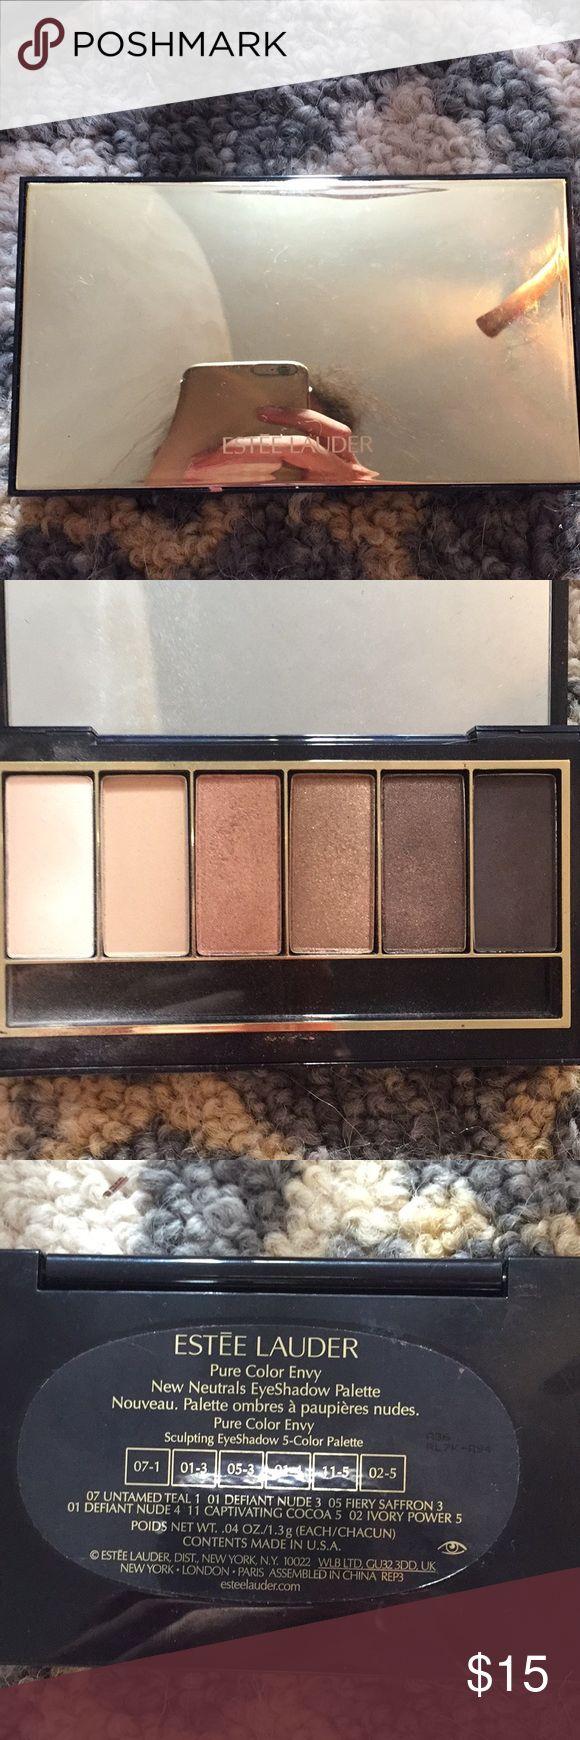 71 Best How To Do Eyeshadow Images On Pinterest Eyediagramjpg Este Lauder Palette Coool Tones Estee Makeup